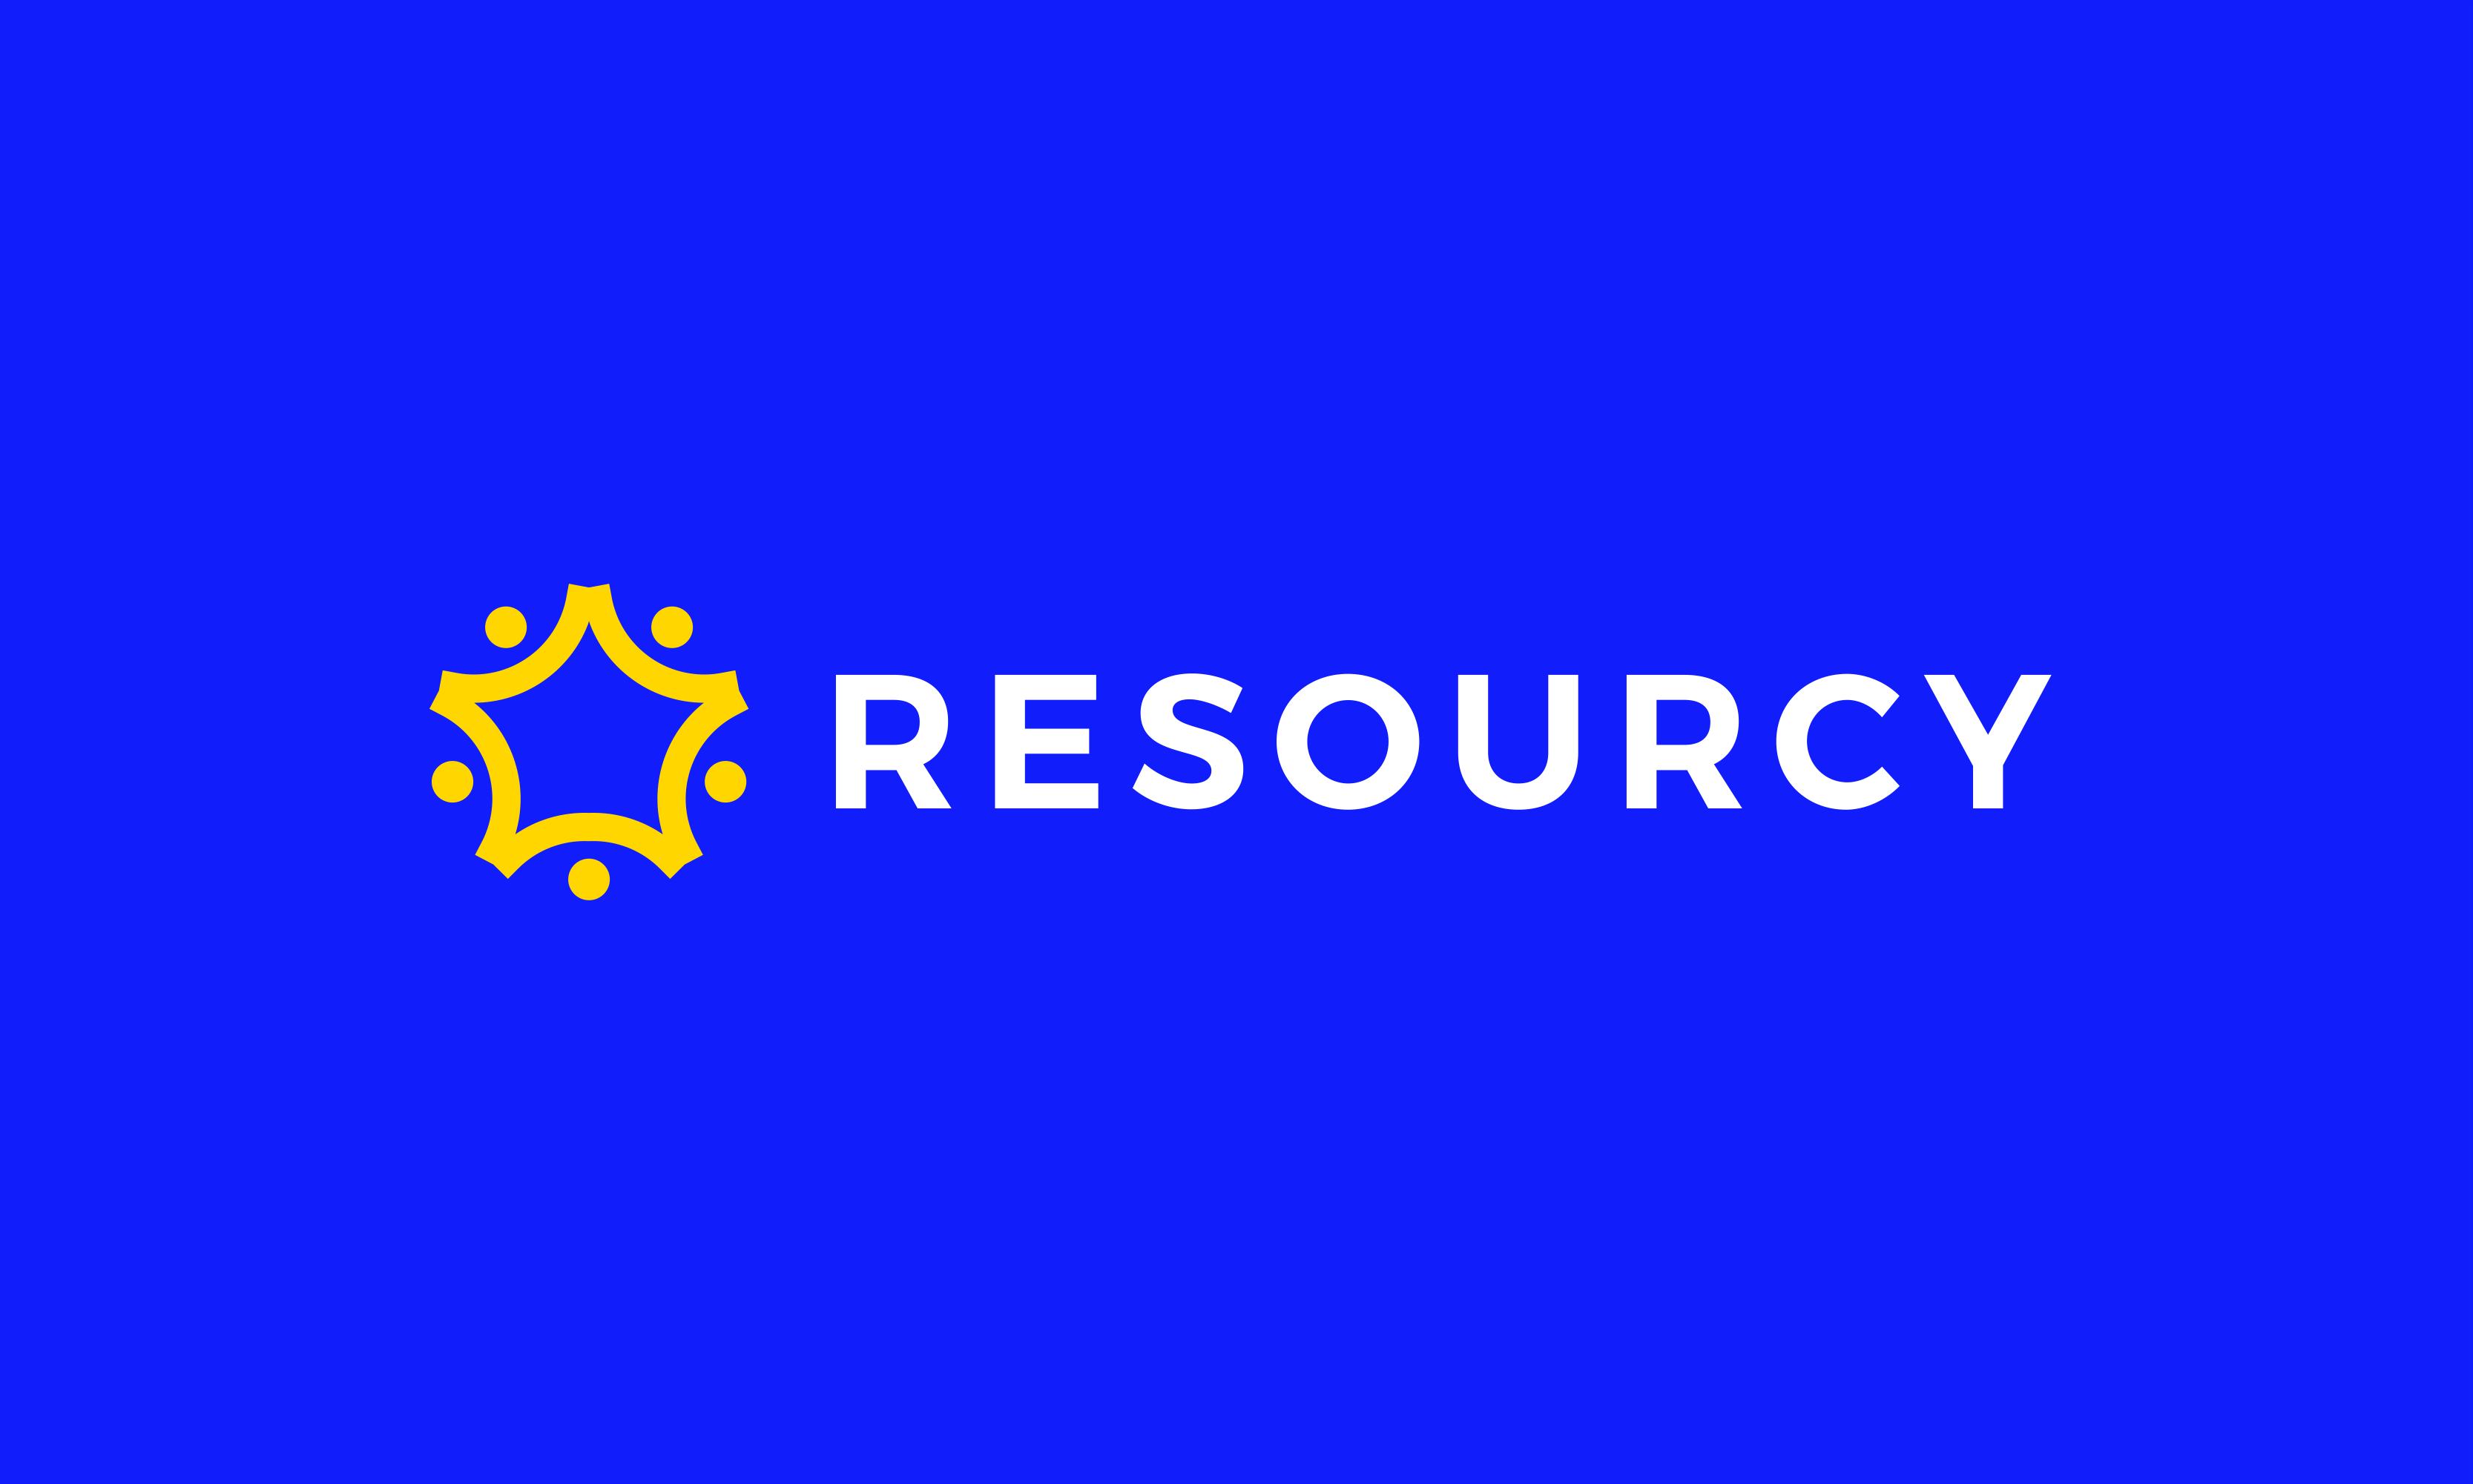 Resourcy